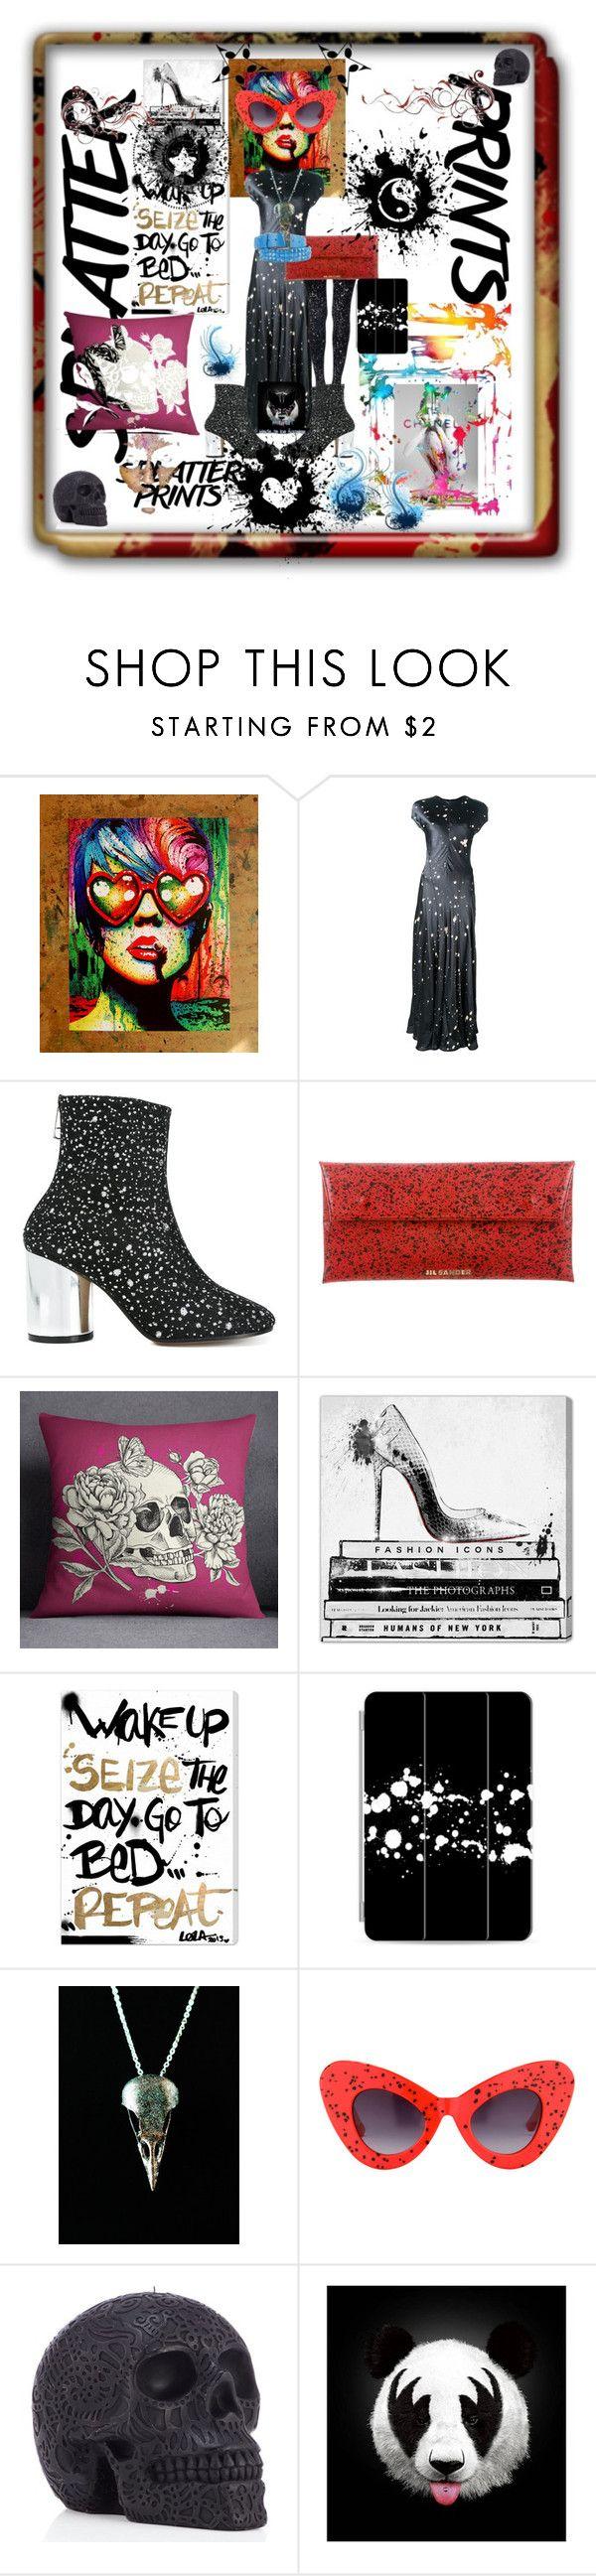 """Splatter ⚛️ Madness ⚛️Diva"" by maijah ❤ liked on Polyvore featuring Chanel, Alexander Wang, Maison Margiela, Jil Sander, Oliver Gal Artist Co., Casetify, Jeremy Scott, Monde Mosaic, splatter and Spring2017"